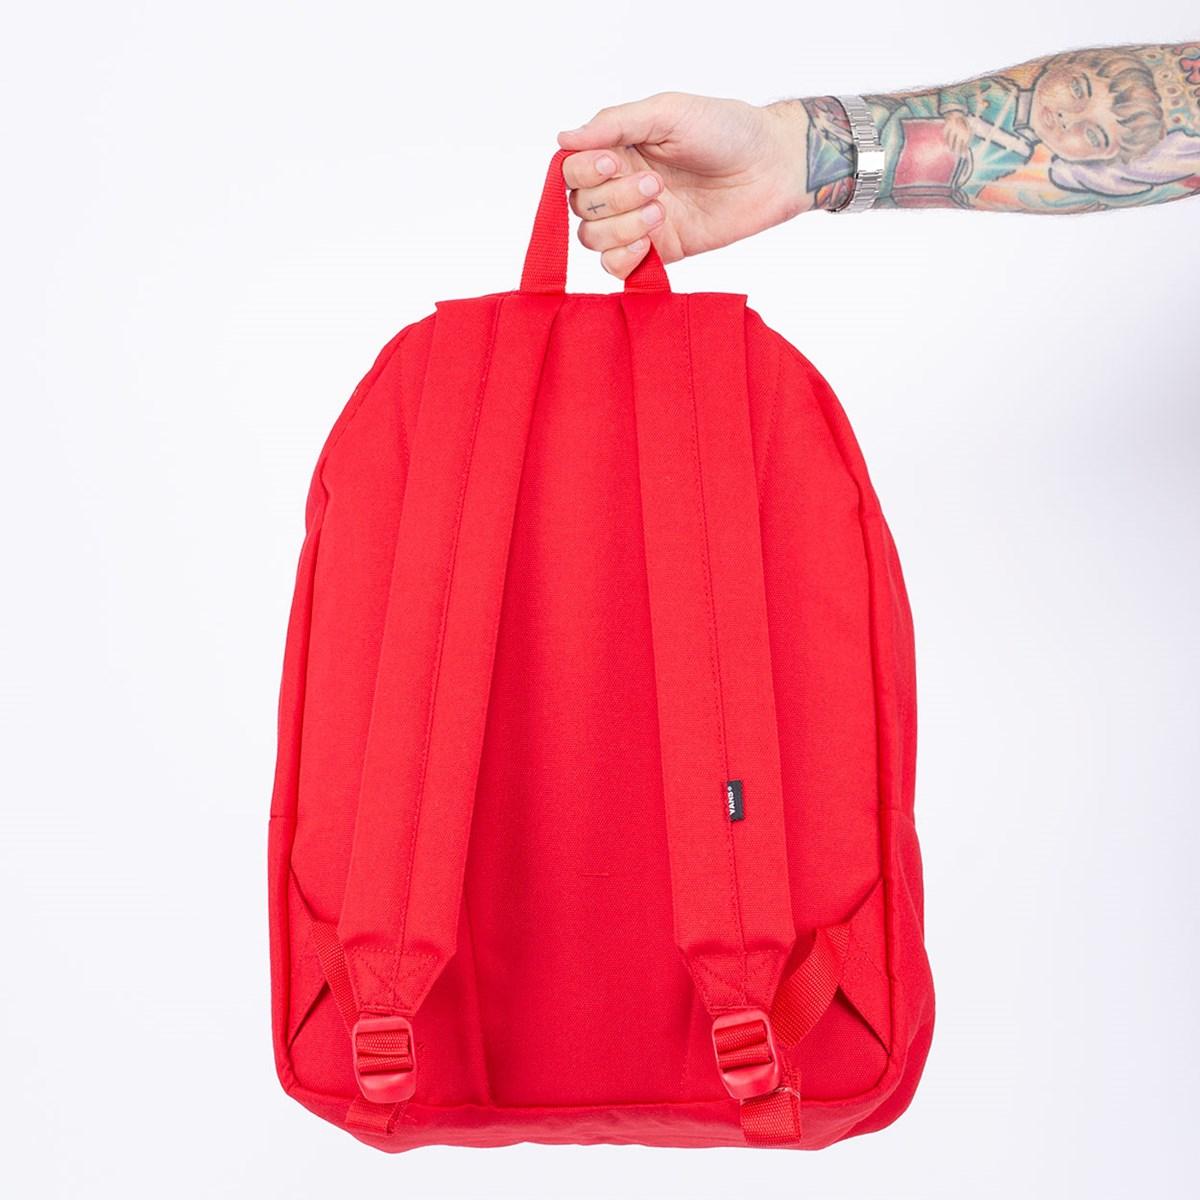 Mochila Vans Old Skool III Backpack Racing Red VN0A3I6RIZQ